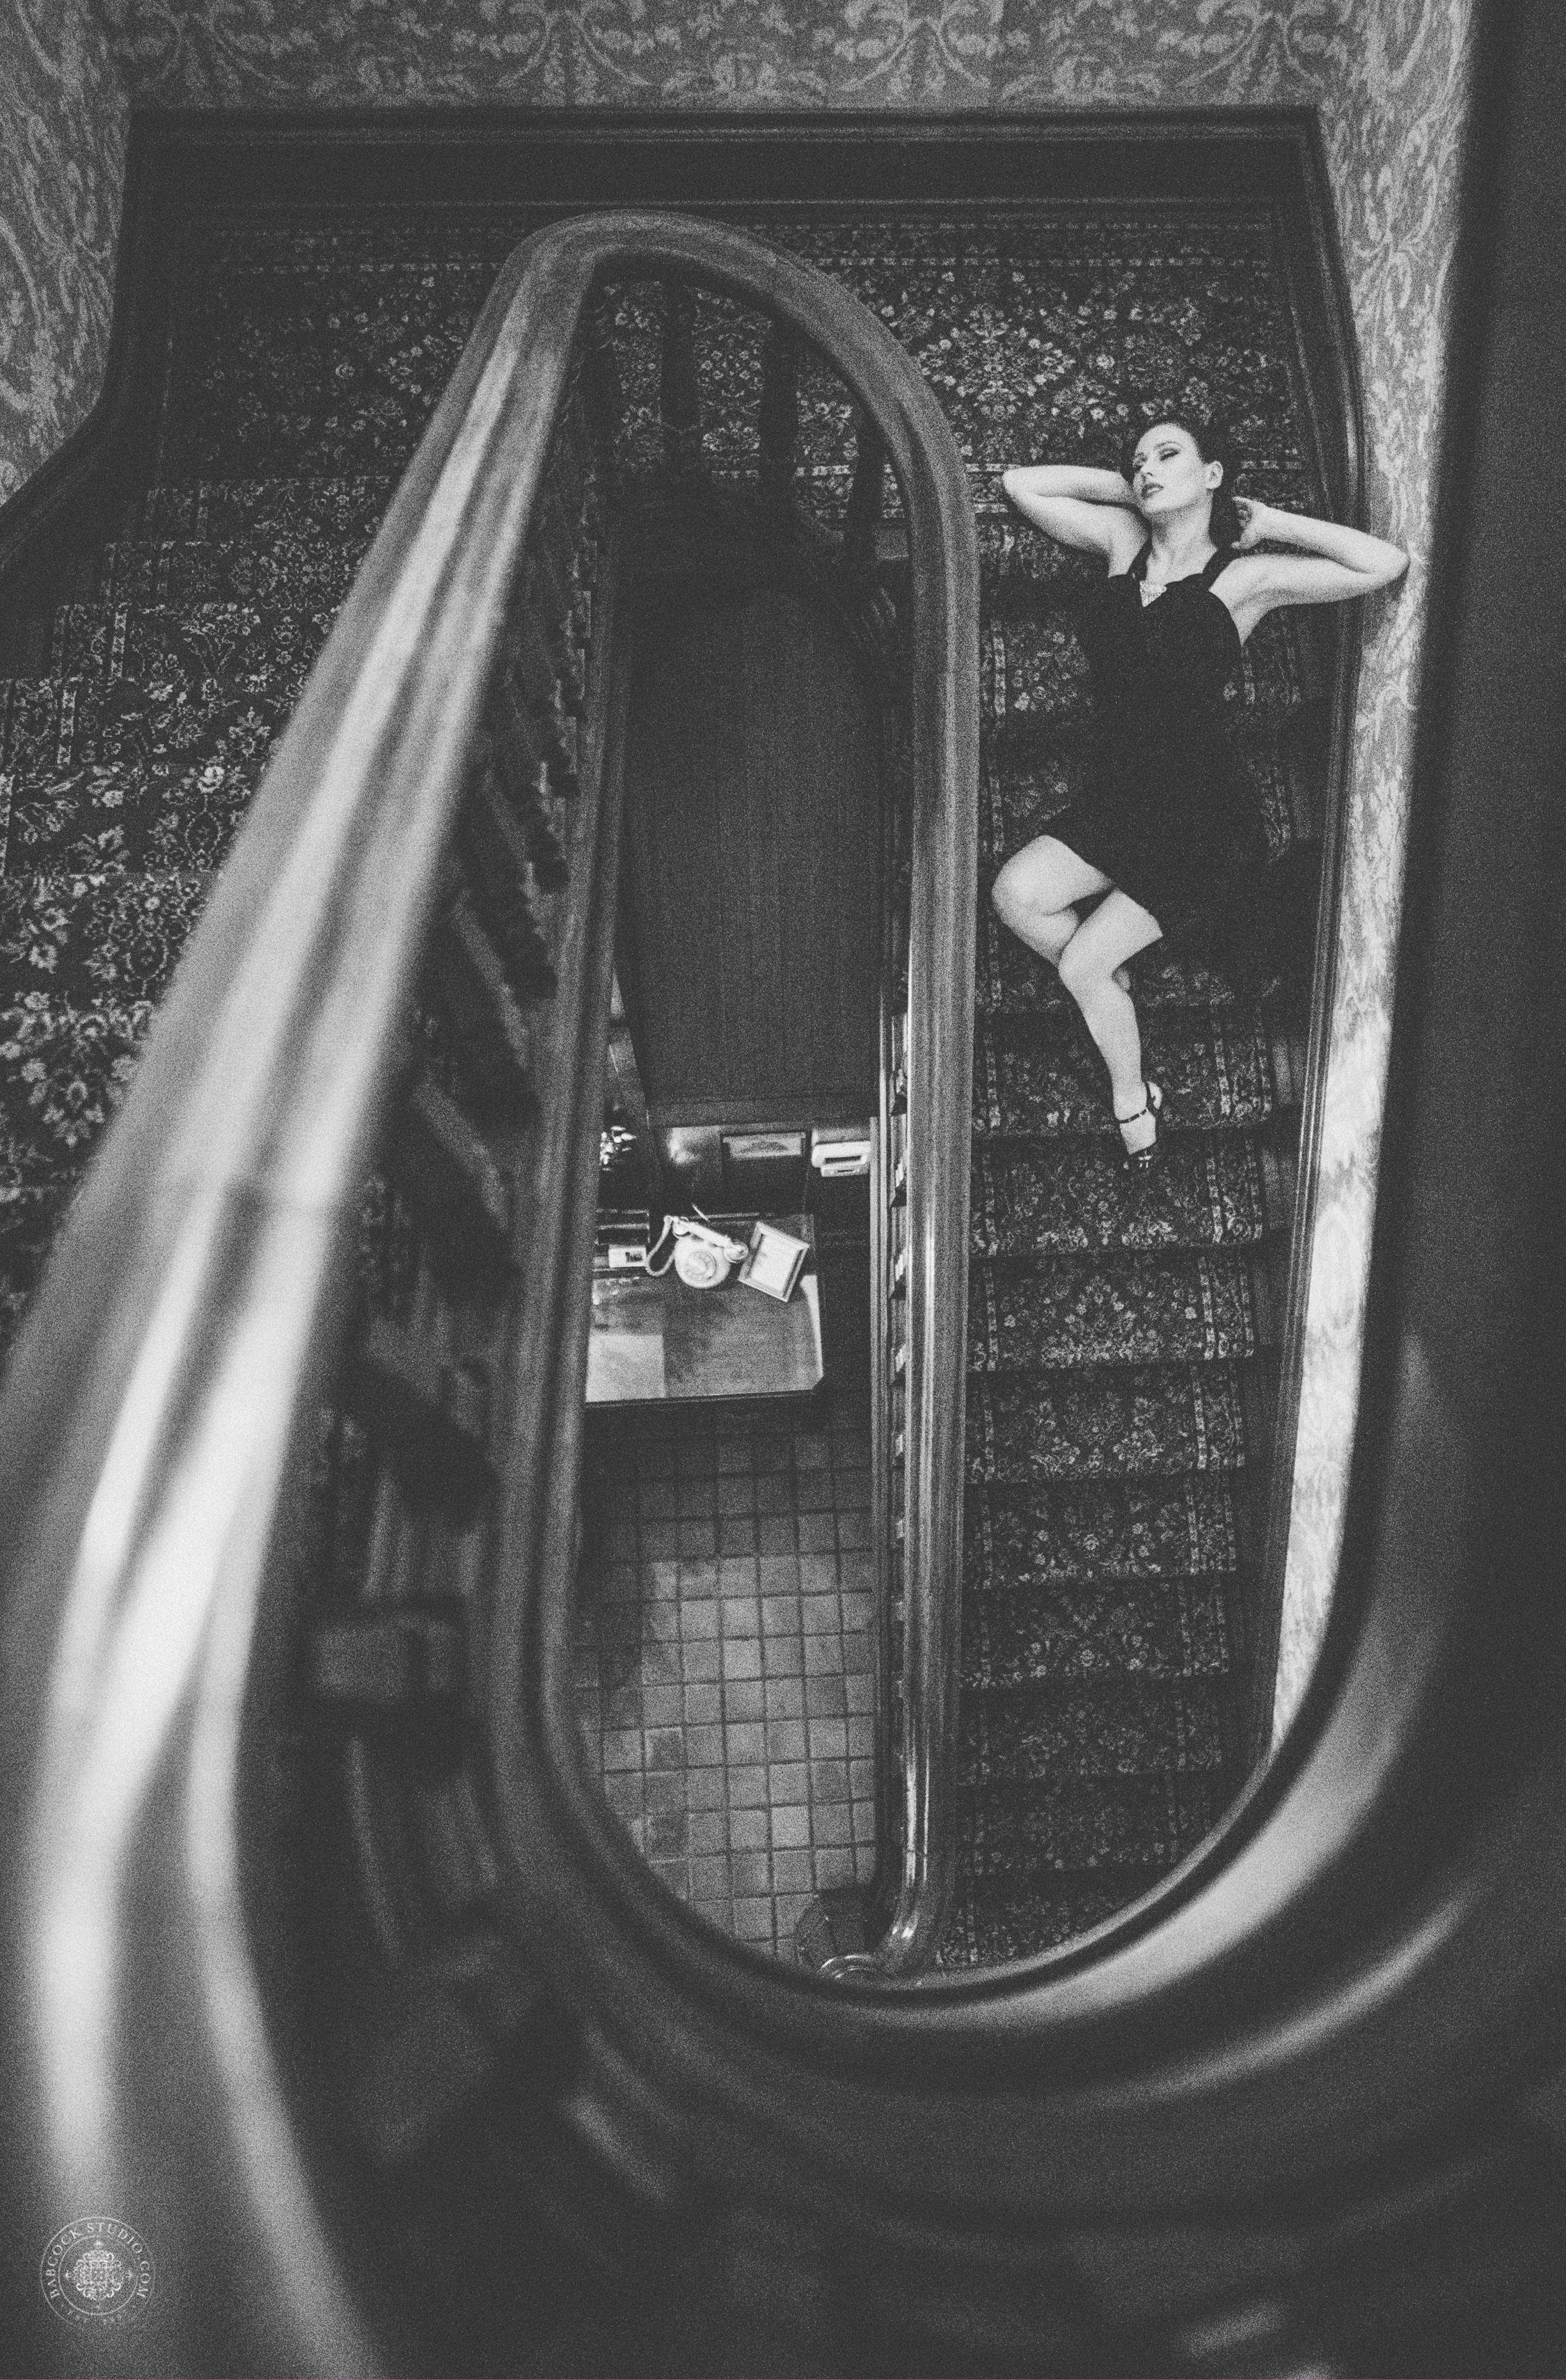 chris-eden-vintage-styled-photographer-dayton-ohio-12.jpg